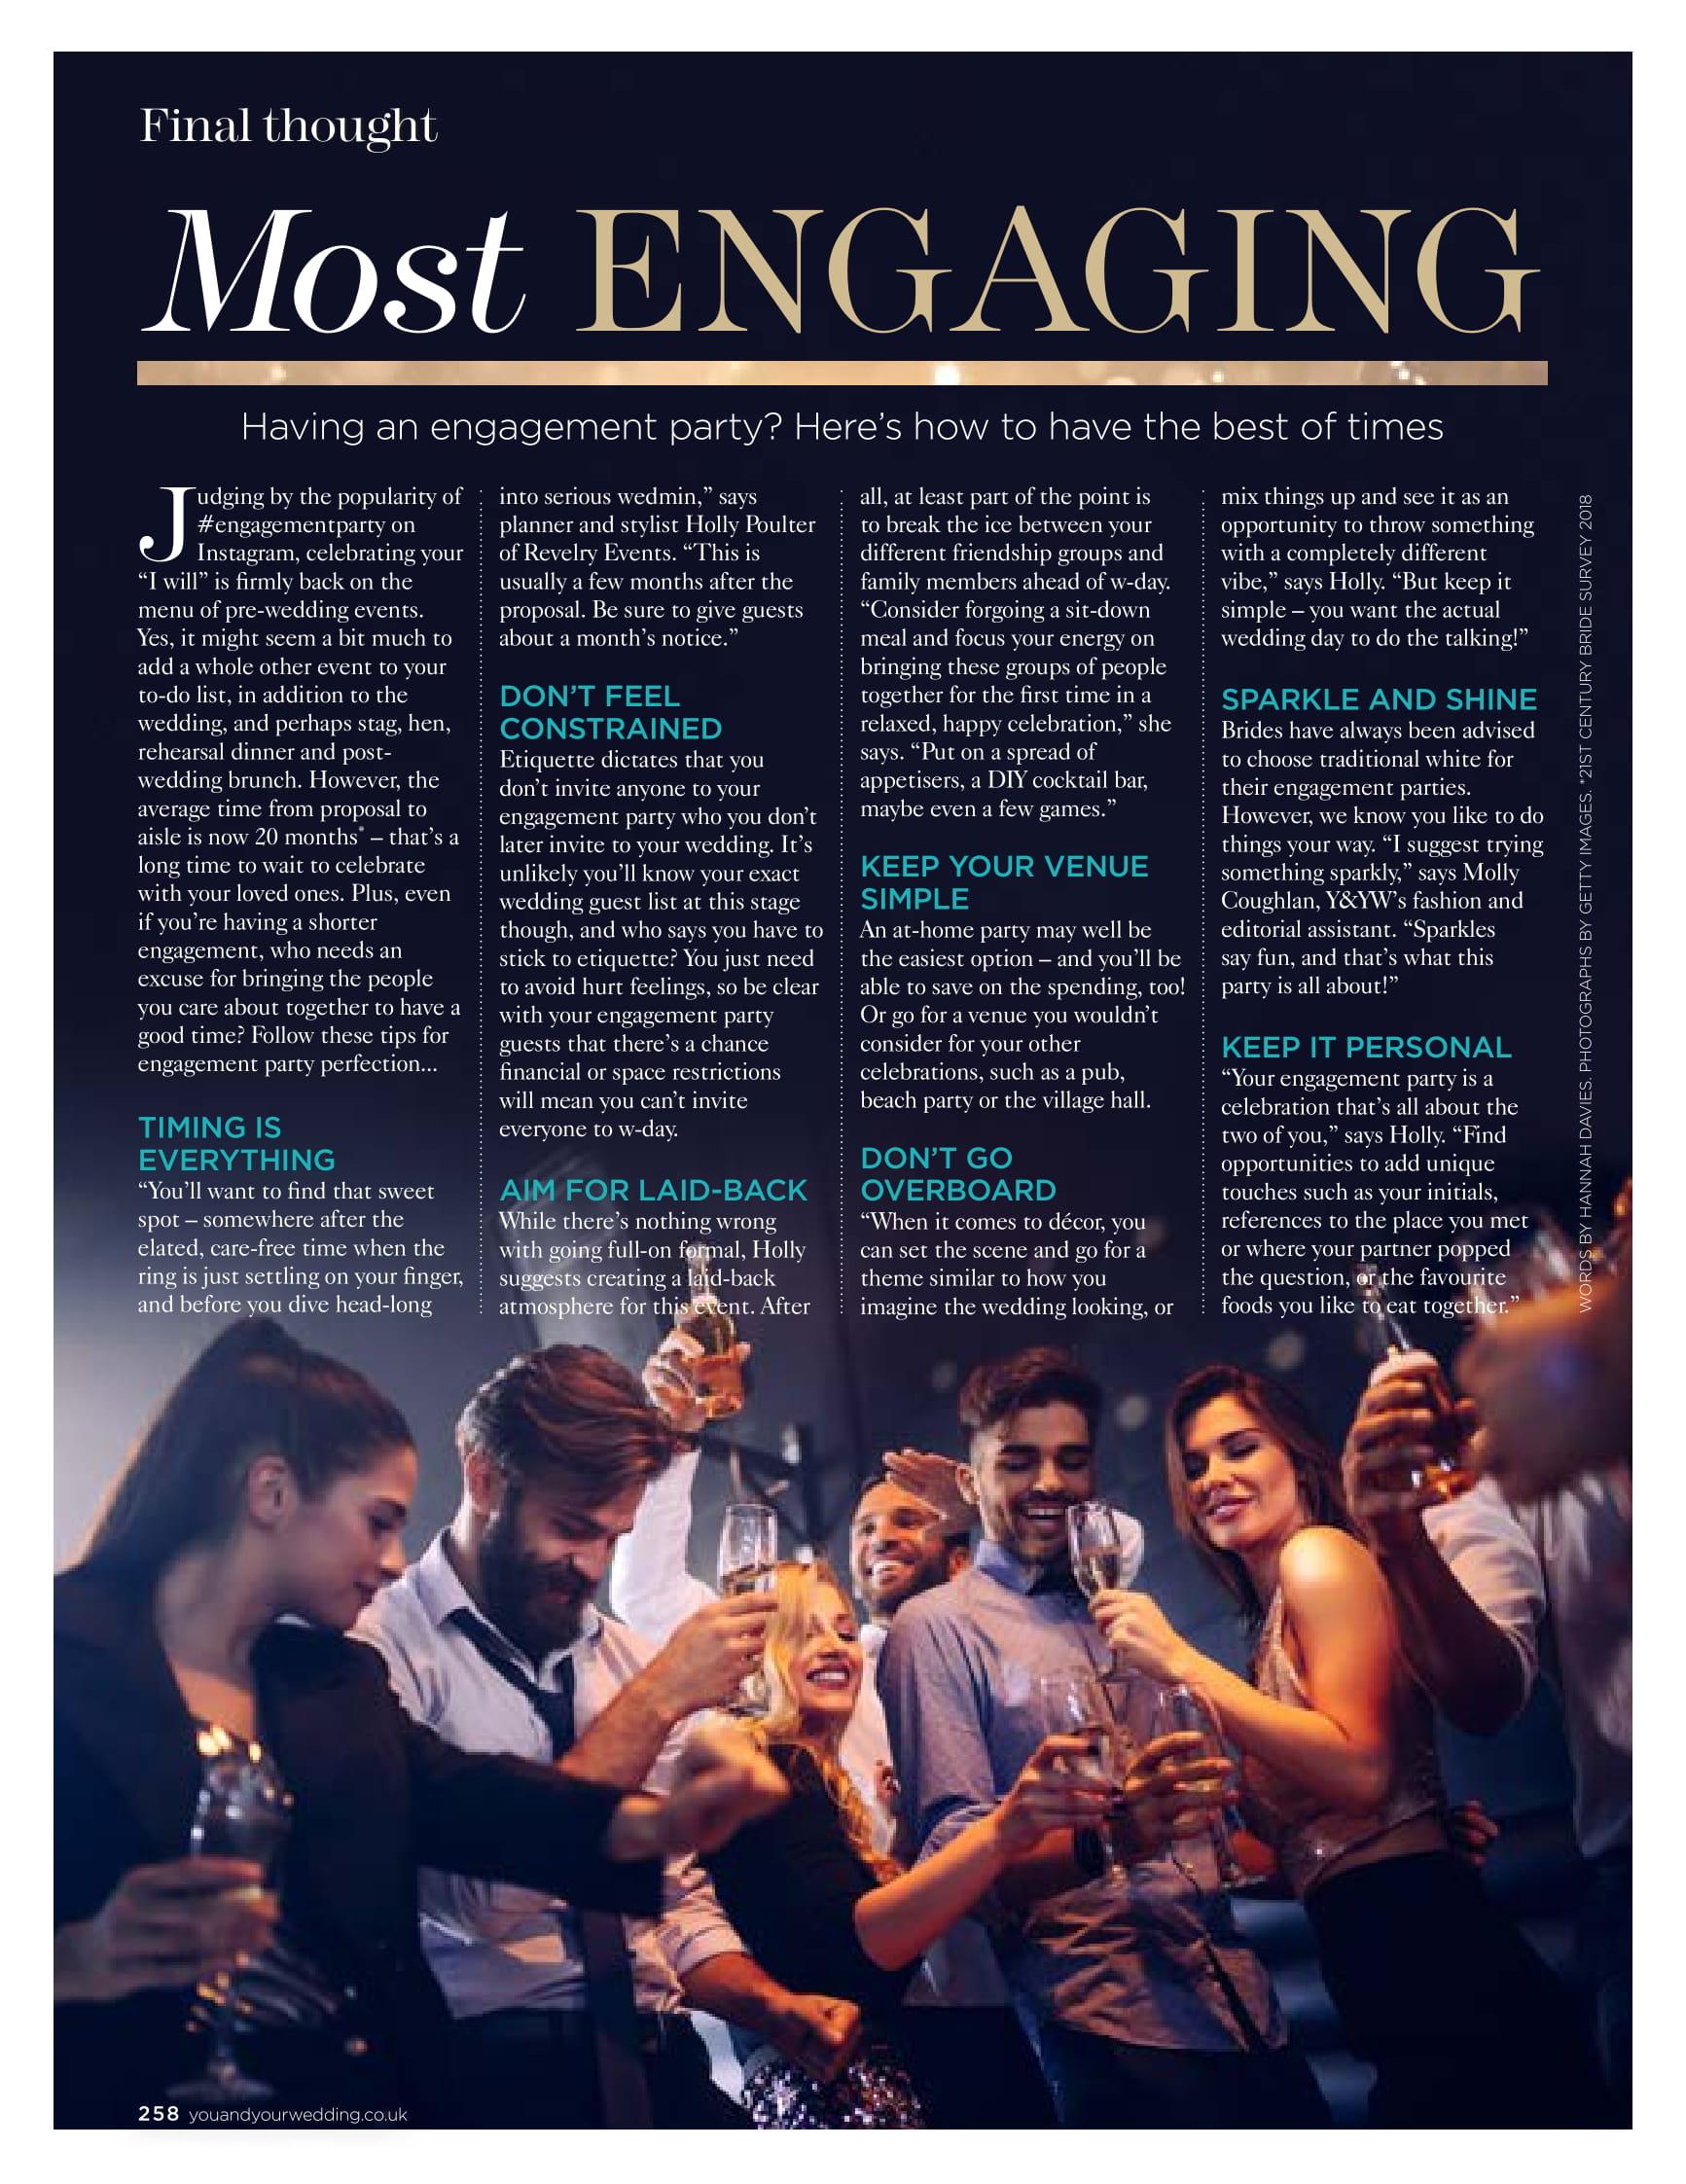 FebMar engagement parties-1.jpg